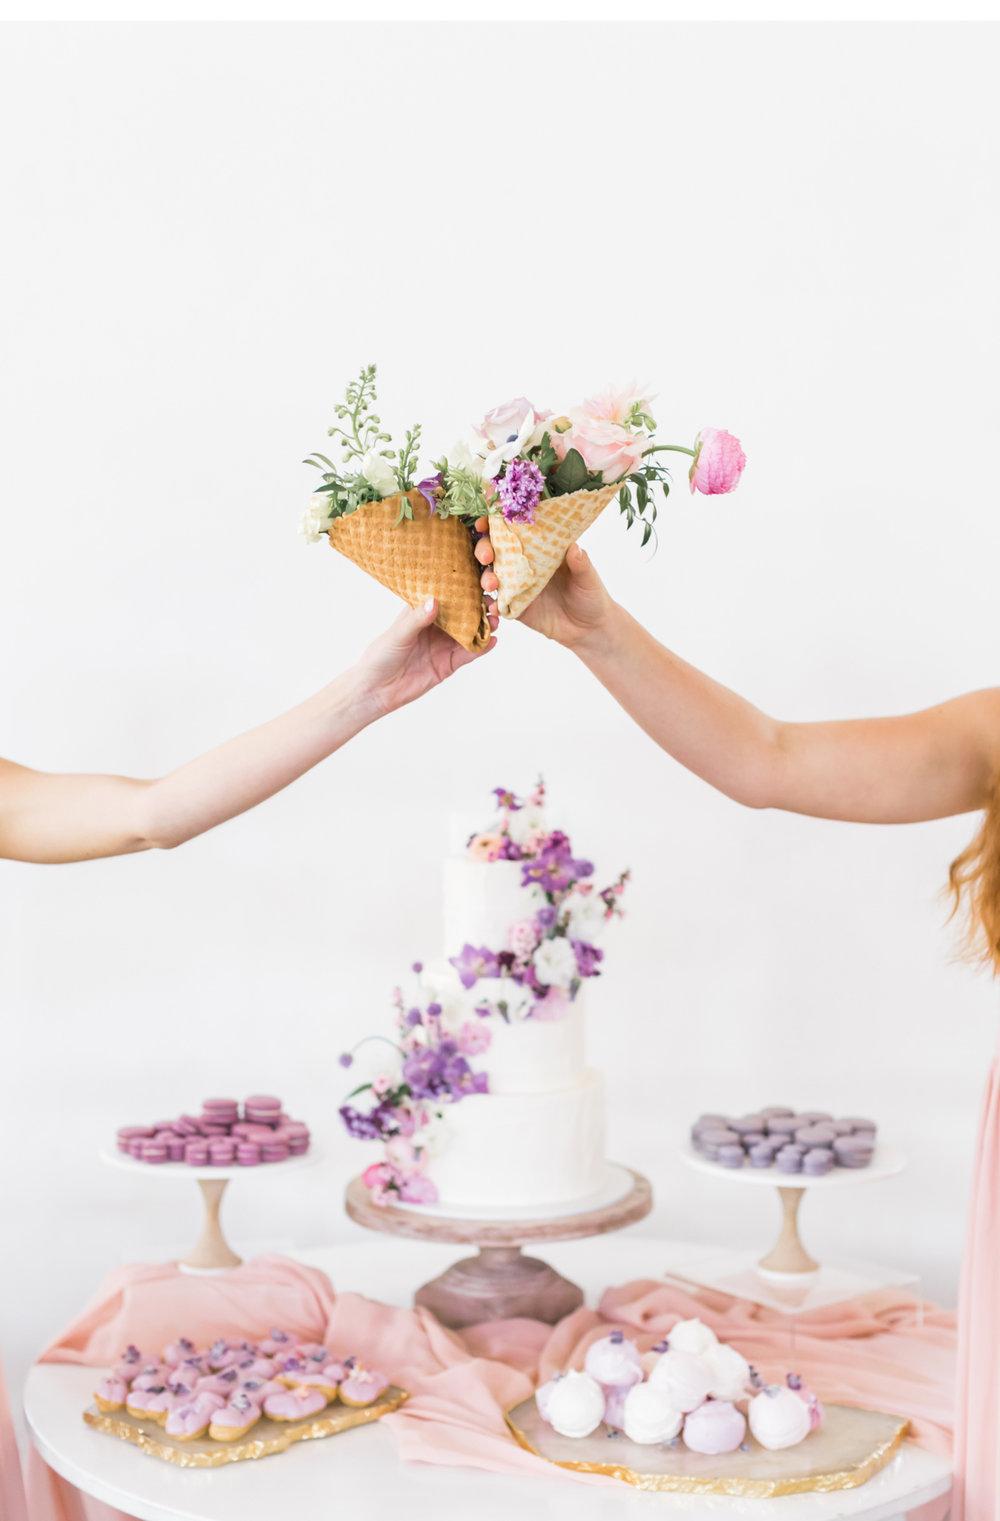 Malibu-Weddings-Natalie-Schutt-Photography-Inspired-by-This_03.jpg